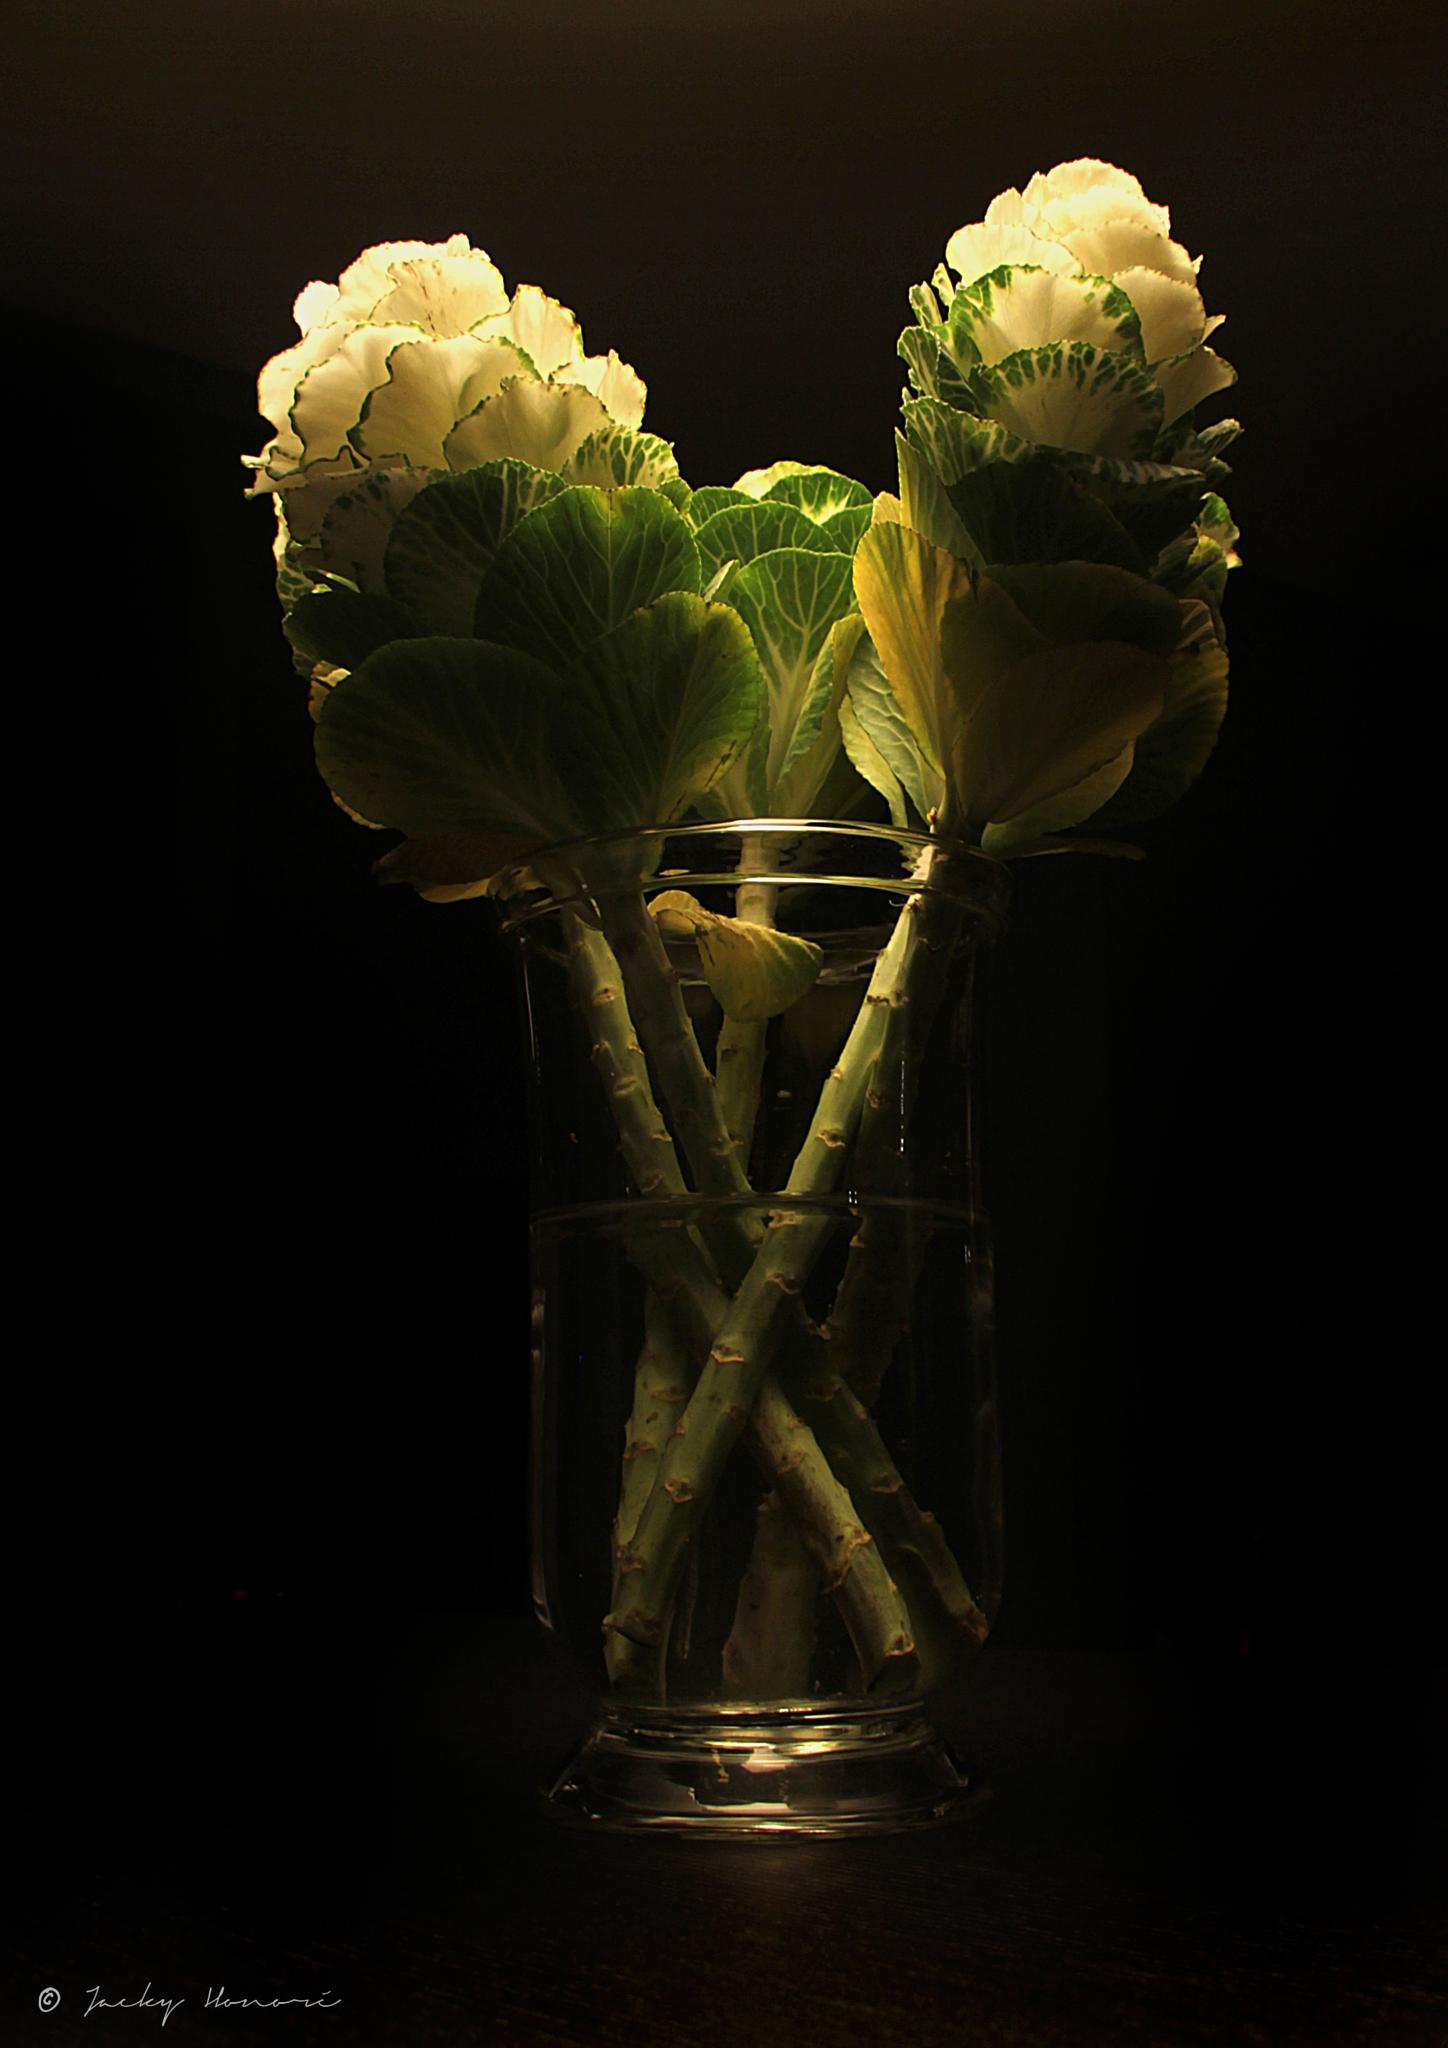 Flowers01 by Jacky Honoré